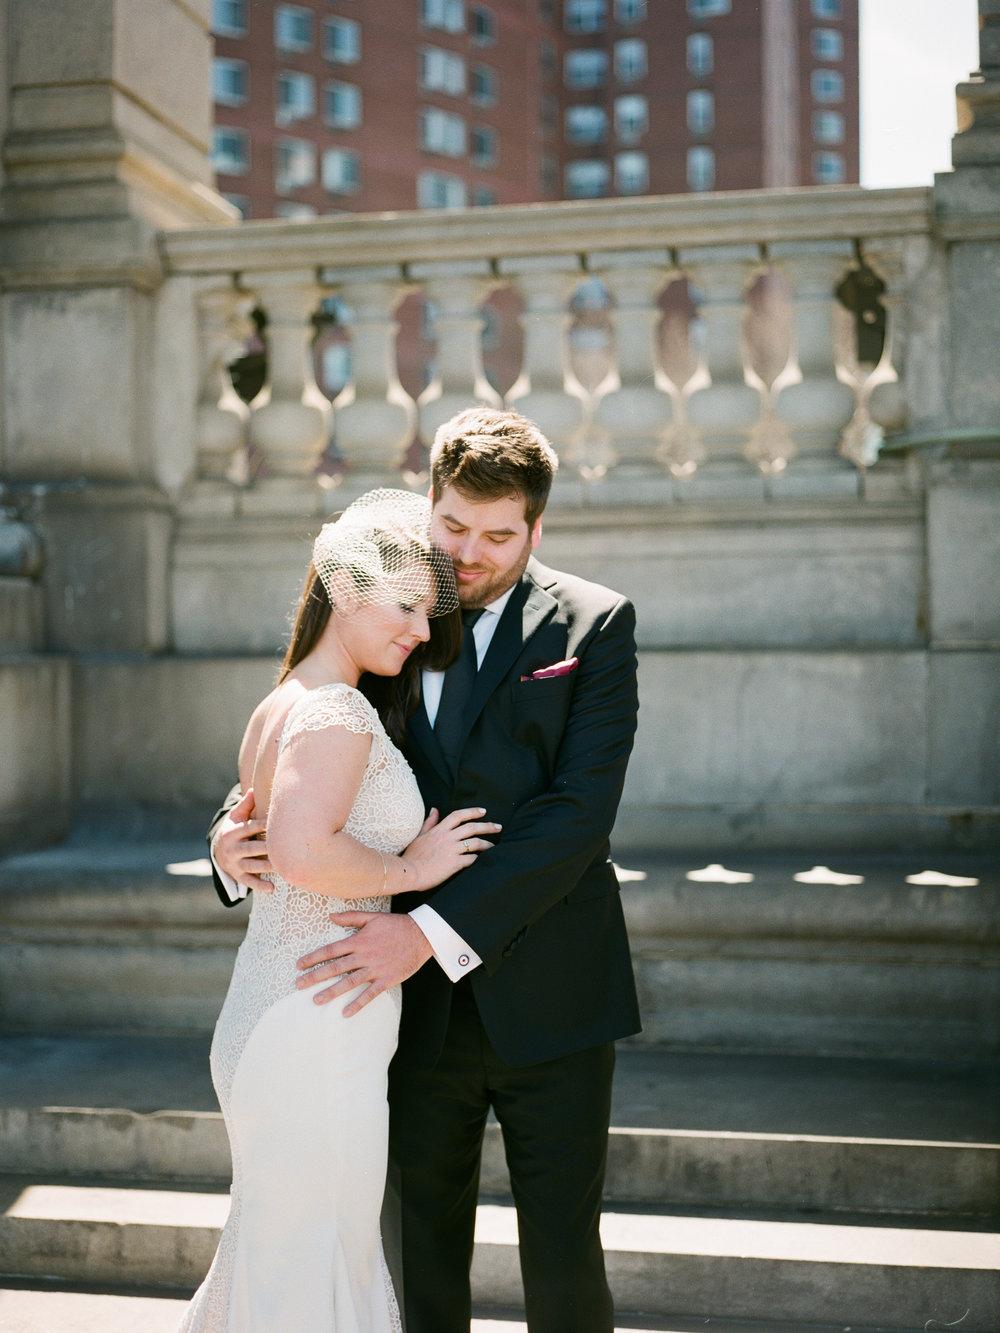 Claire+James_MediumFormat_Wedding_PRINT-55.jpg